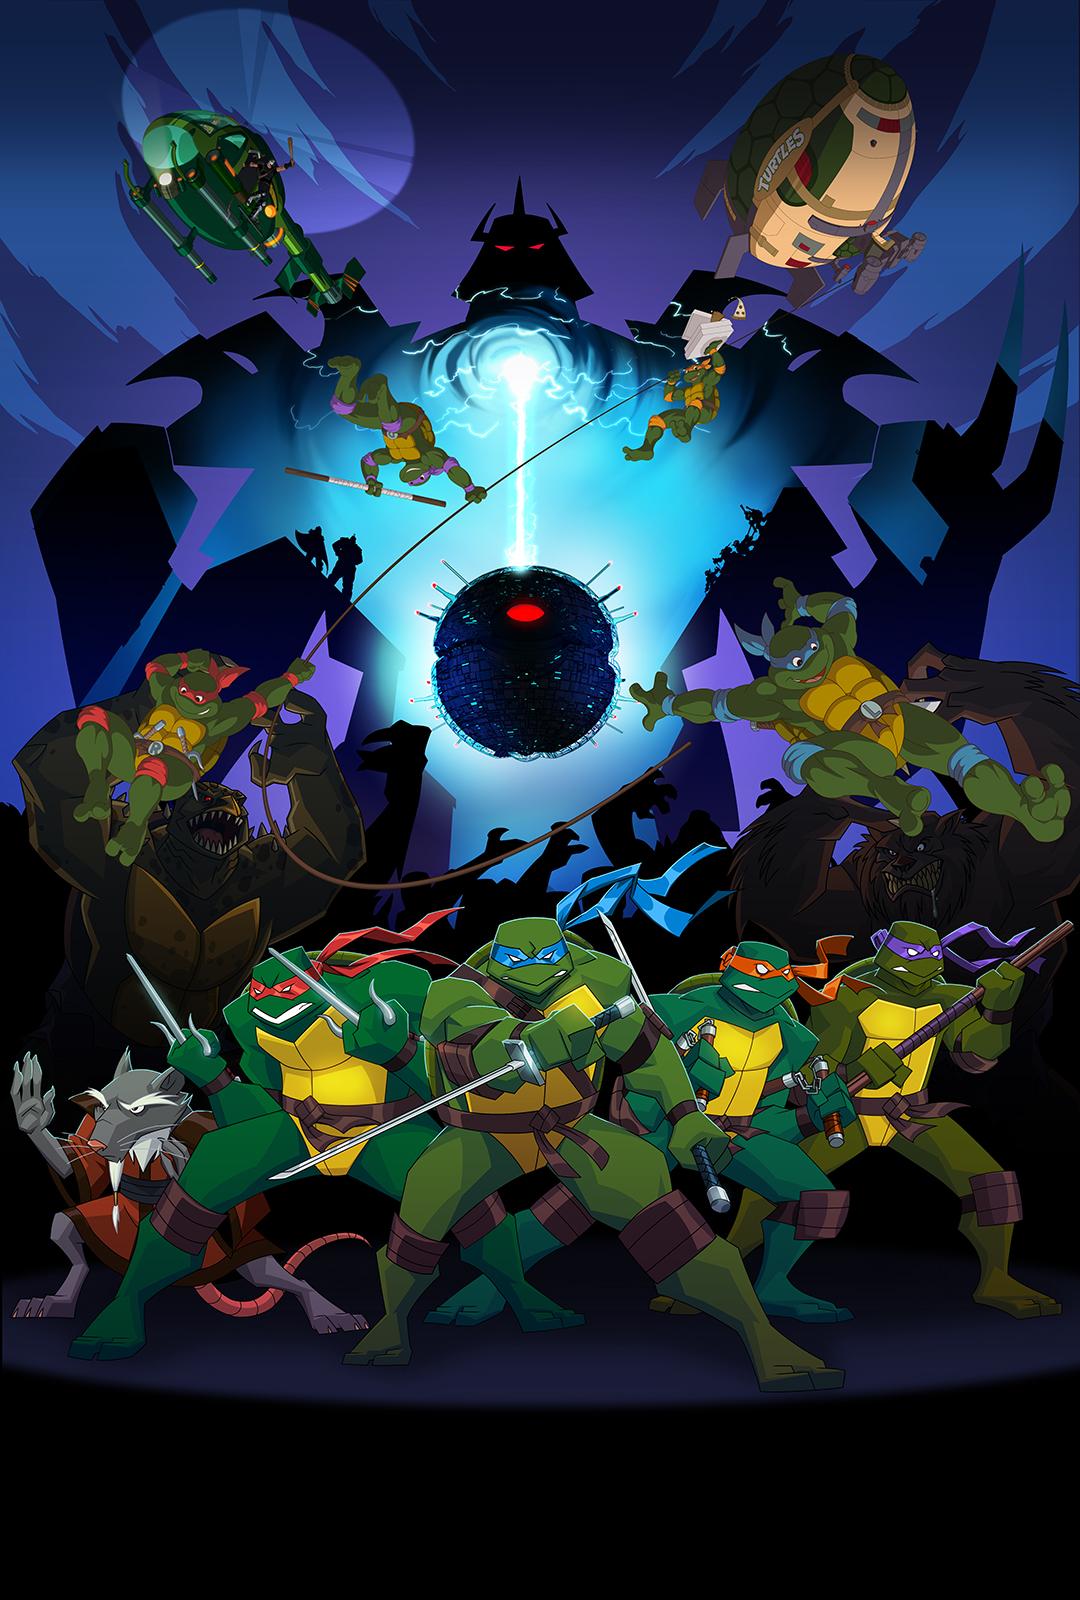 Las Tortugas Ninja vuelven - Página 2 Turtles_Forever_Poster_by_E_Mann